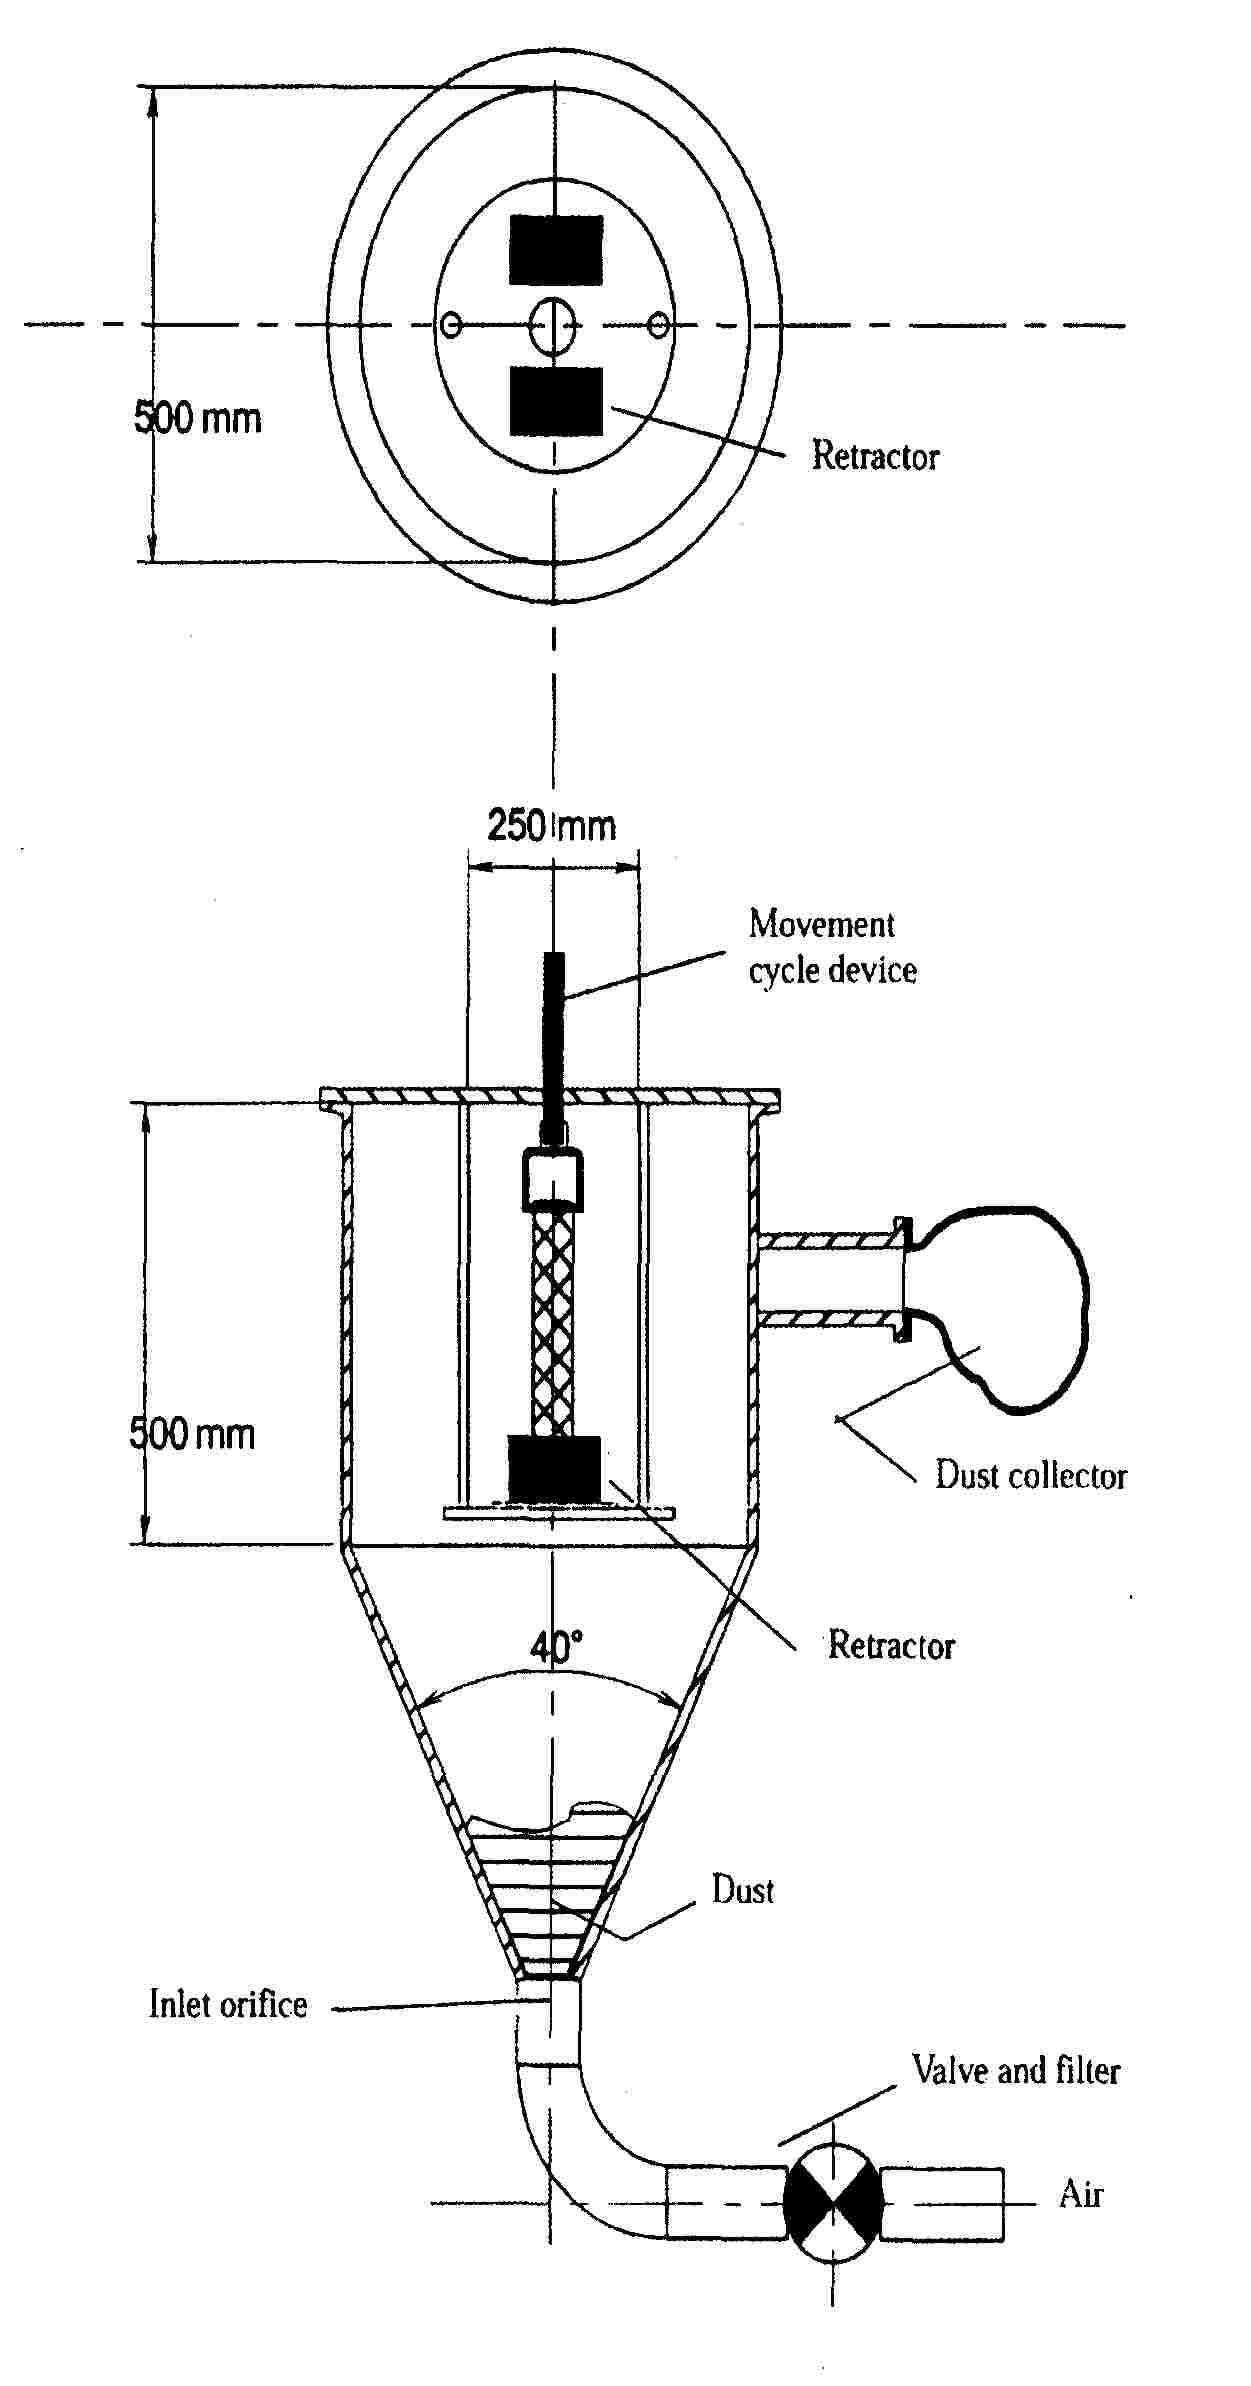 Eur Lex 01977l0541 20130701 En 480 Volt Motor Wiring Diagram Image